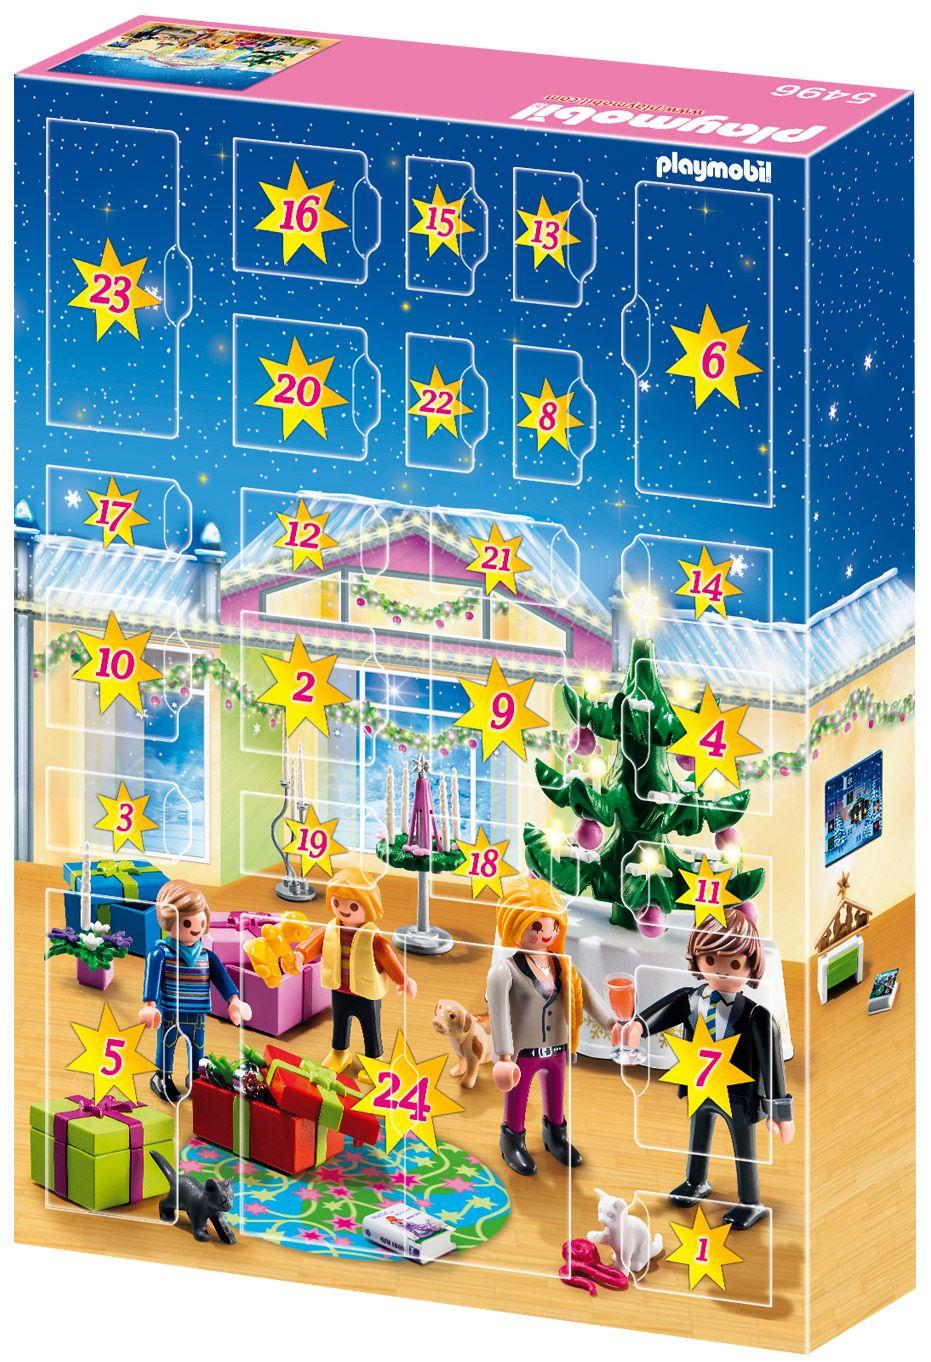 playmobil christmas 5496 pas cher calendrier de l avent r veillon de no l. Black Bedroom Furniture Sets. Home Design Ideas